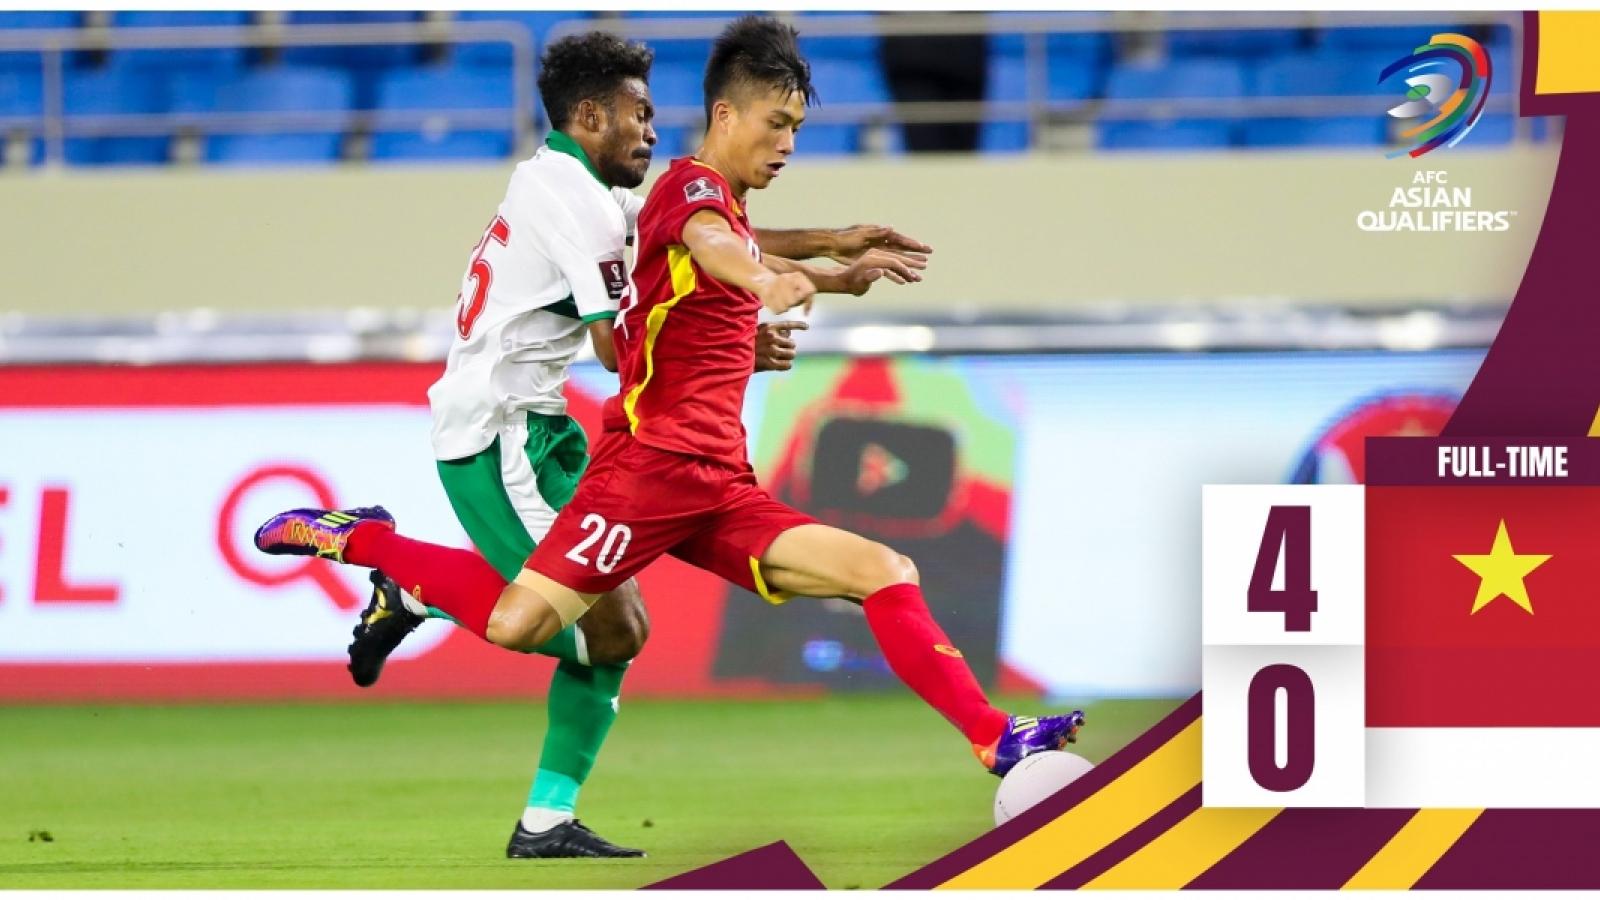 Thai media praises Vietnamese victory over Indonesia